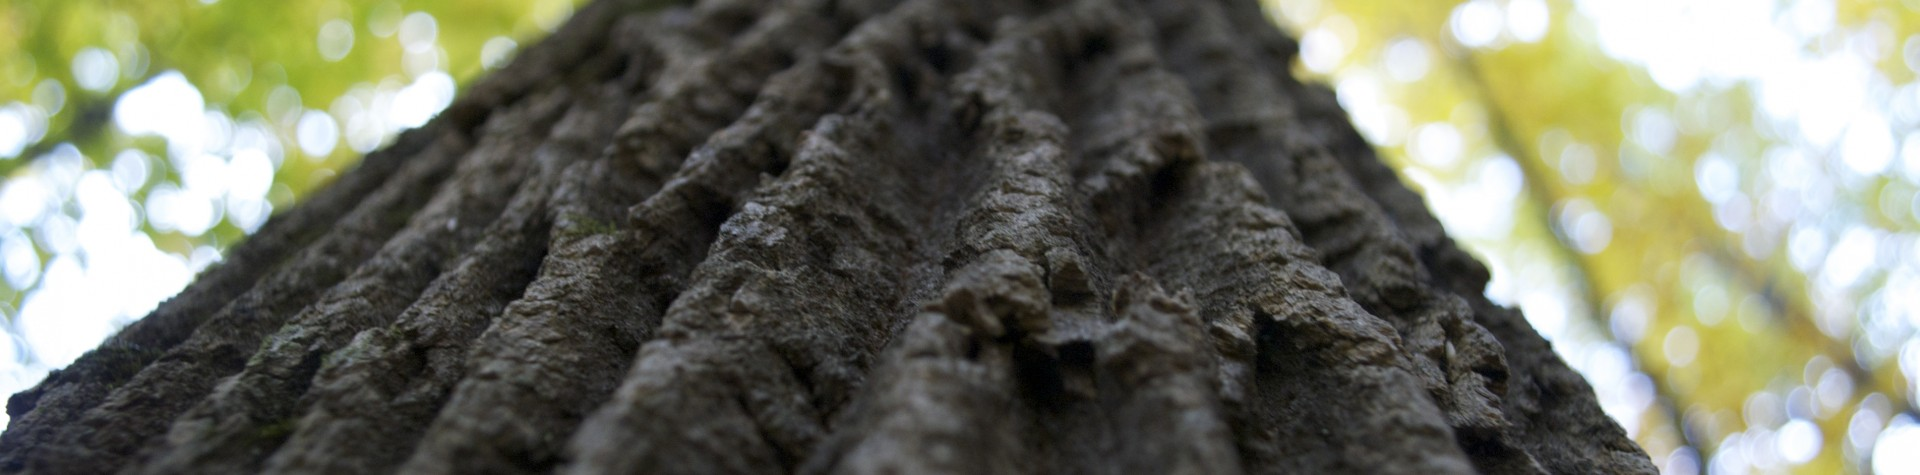 Tree-trunk-bobby-soosaar-1920x475